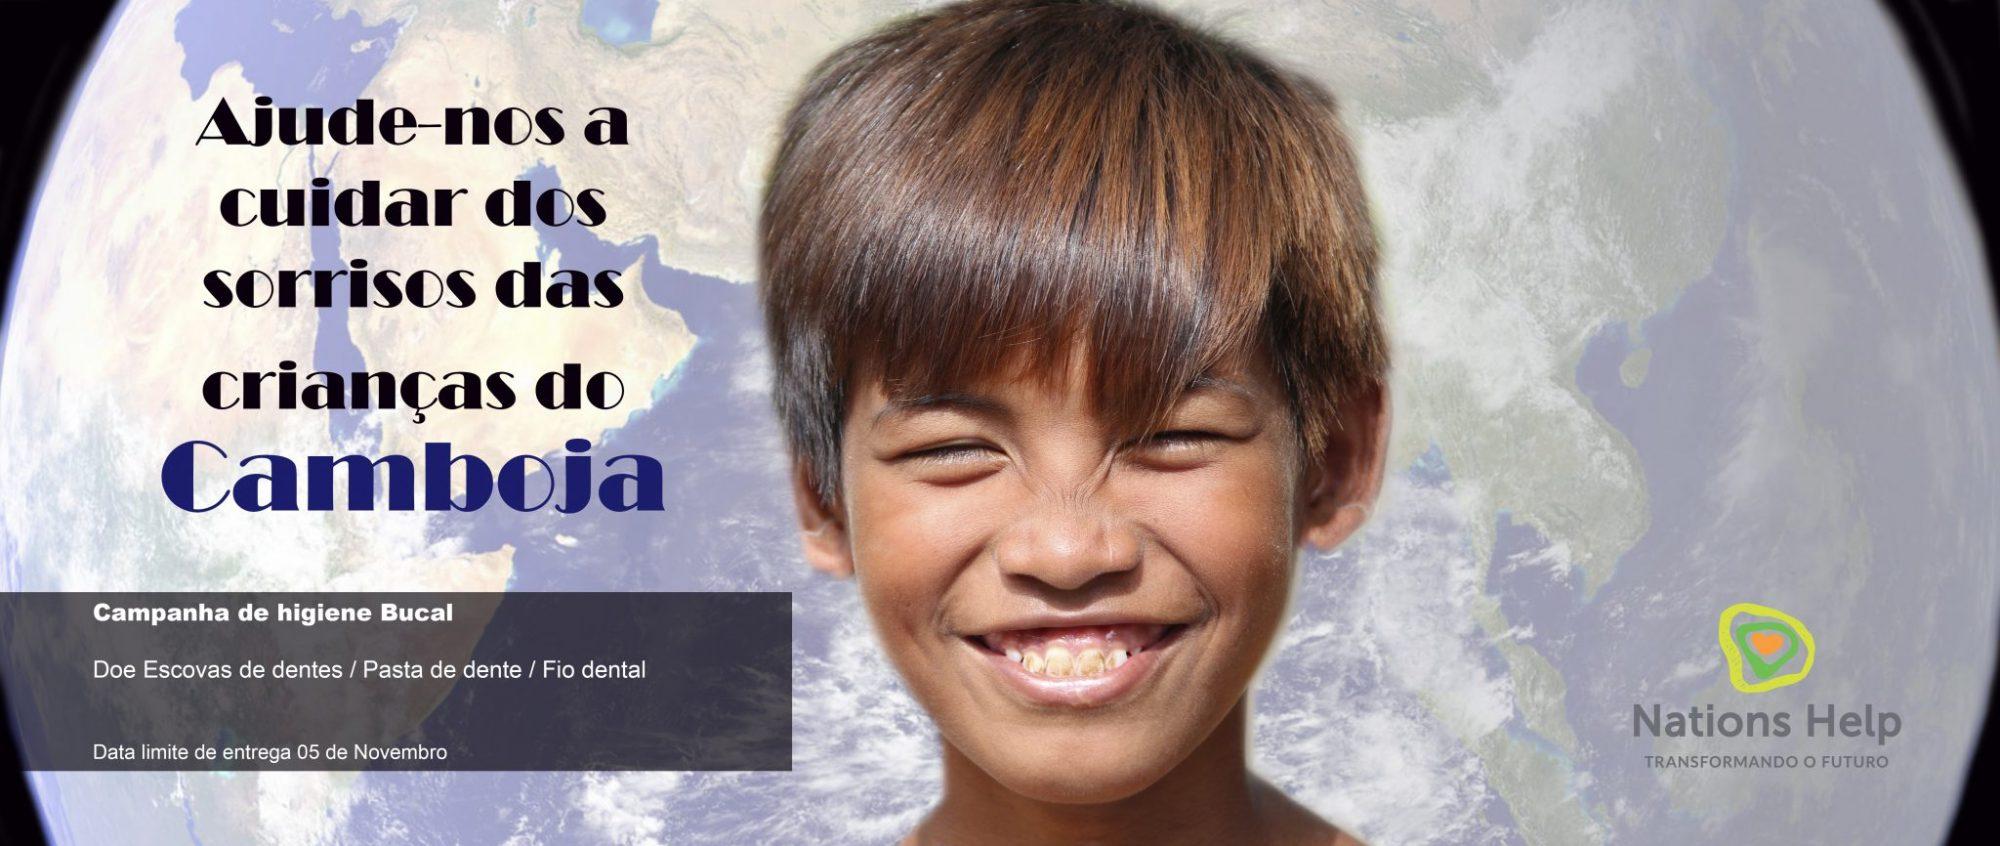 Arte-Camboja-Higiene-bucal-Slide-Site